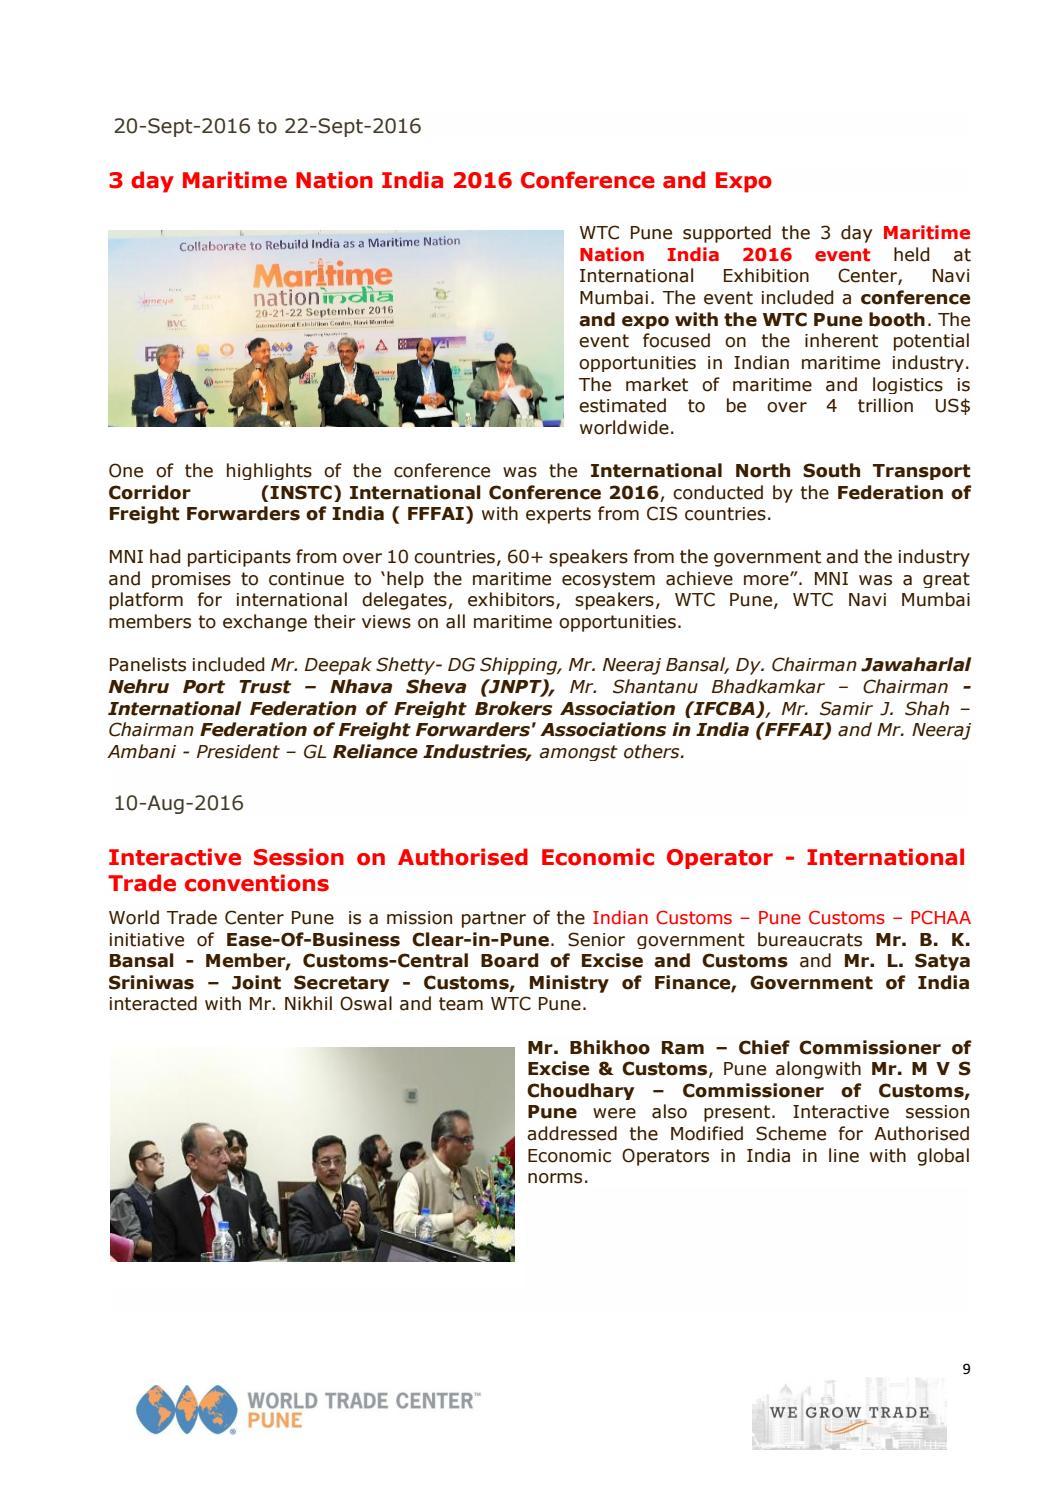 World Trade Center Pune - WTC Pune Event & Network Snapshot